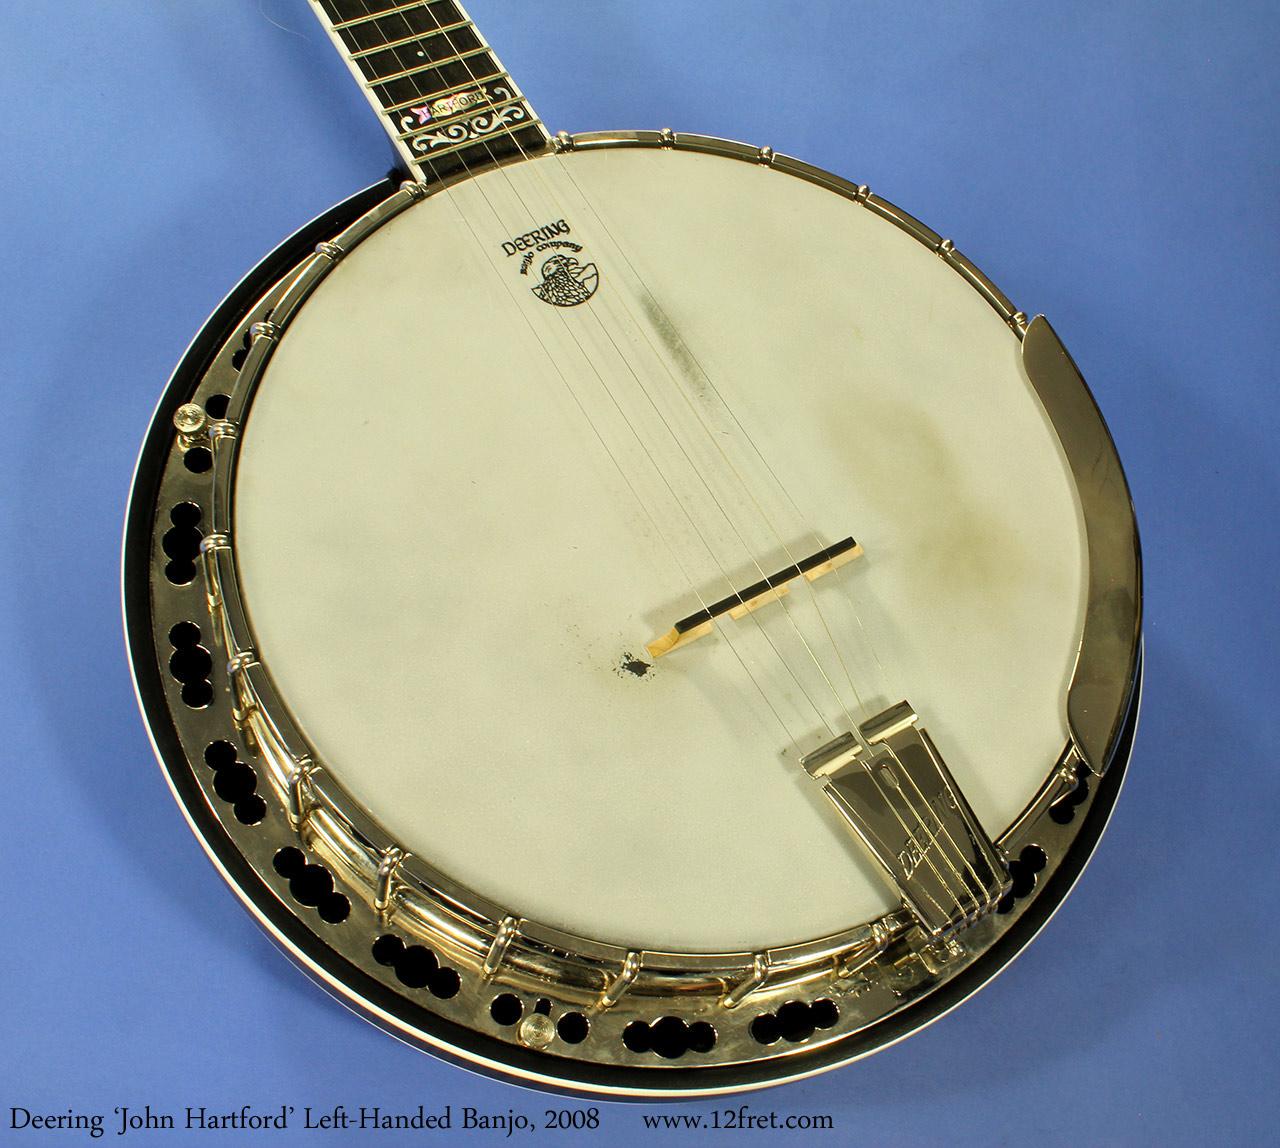 deering-hartford-banjo-lh-2008-cons-top-1